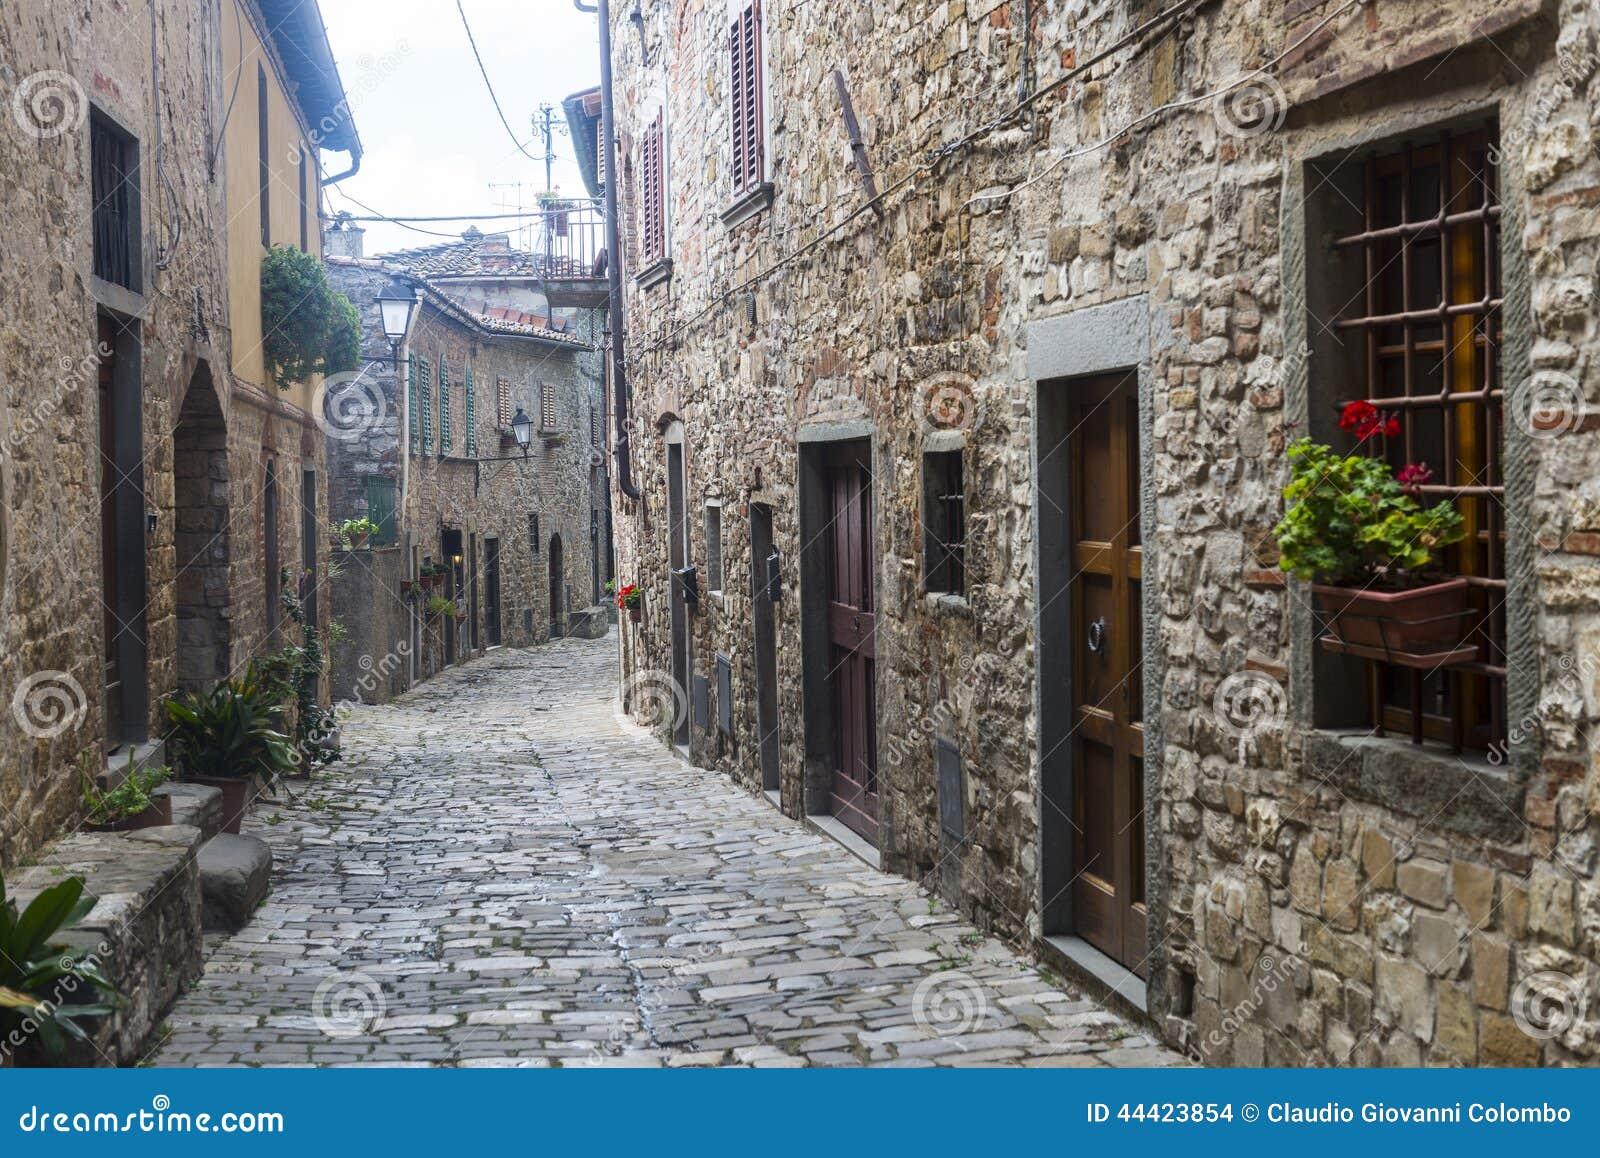 Montefioralle (Chianti, Toscânia)